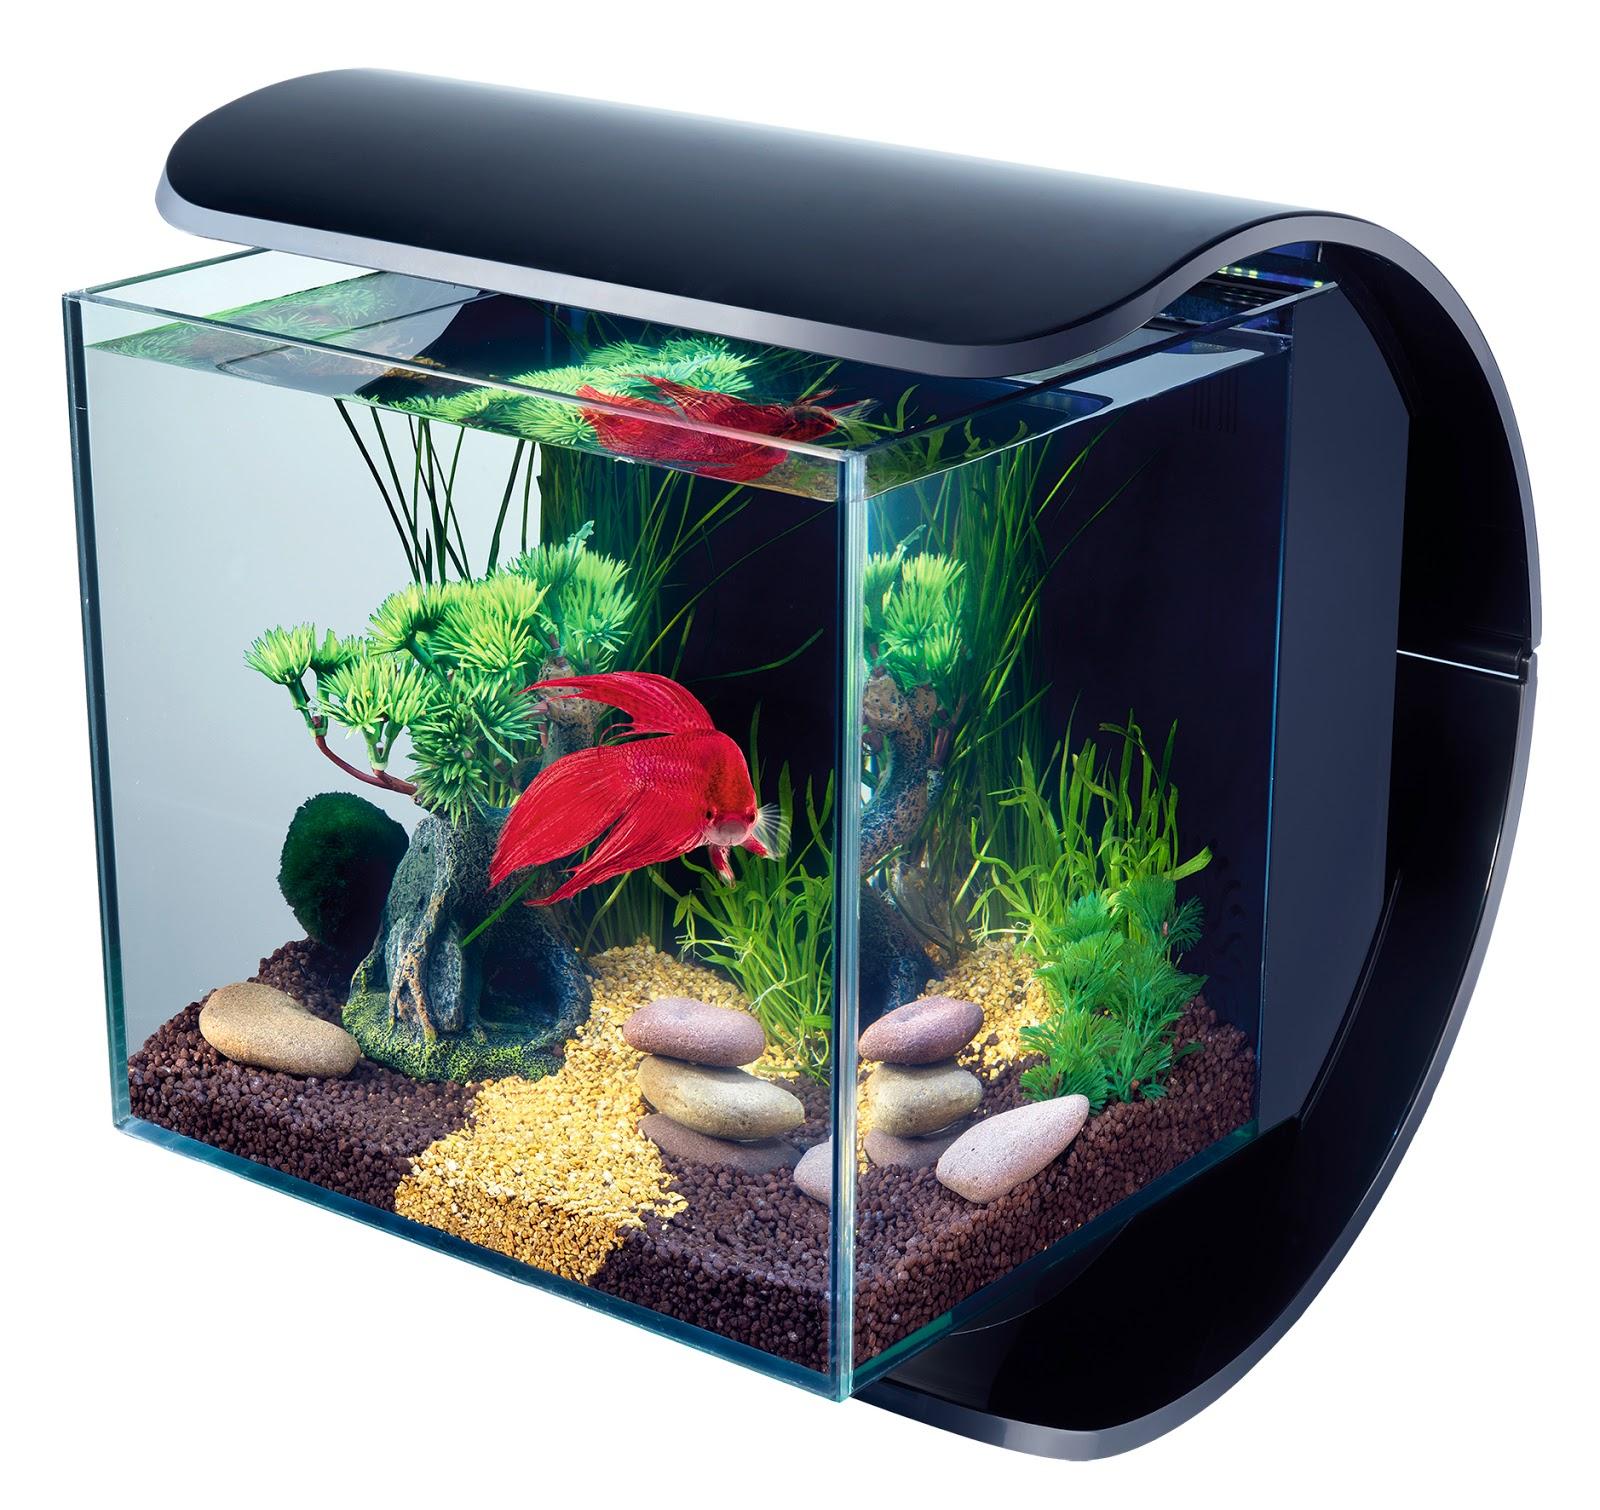 Luxus aquarium pour poisson rouge id es de conception de for Aquarium poisson rouge petit